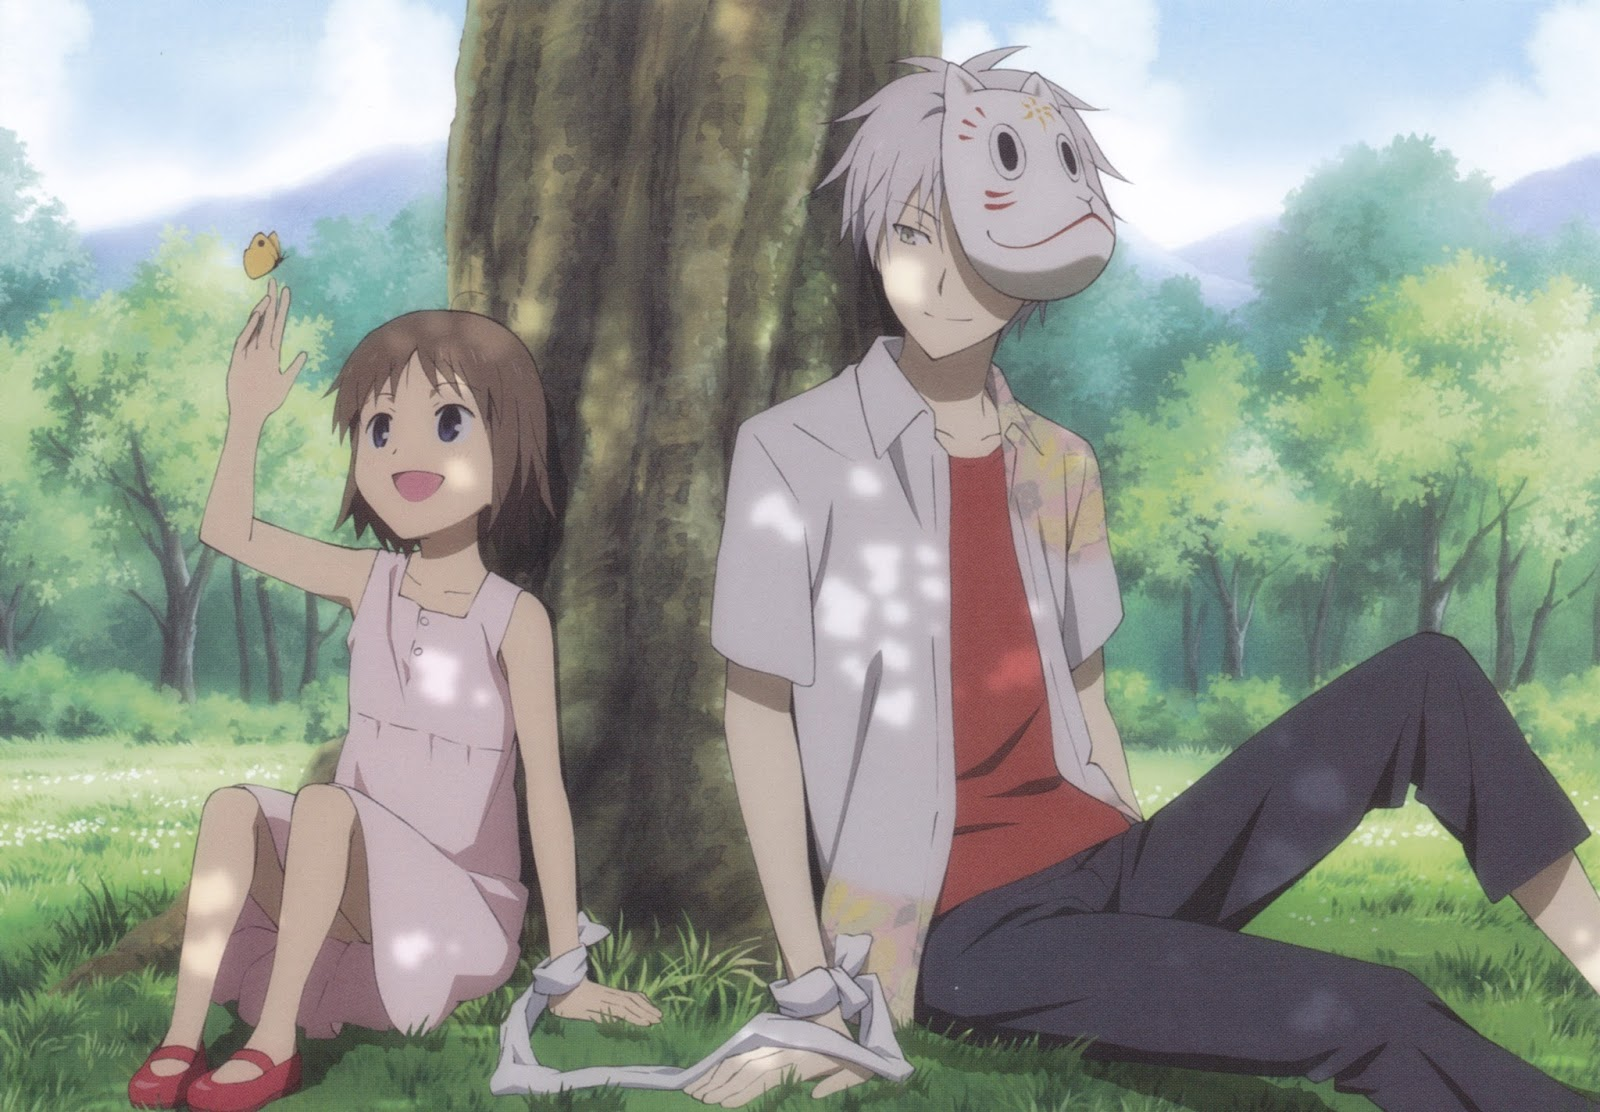 73 Gambar Gambar Anime Hotarubi No Mori E Paling Keren